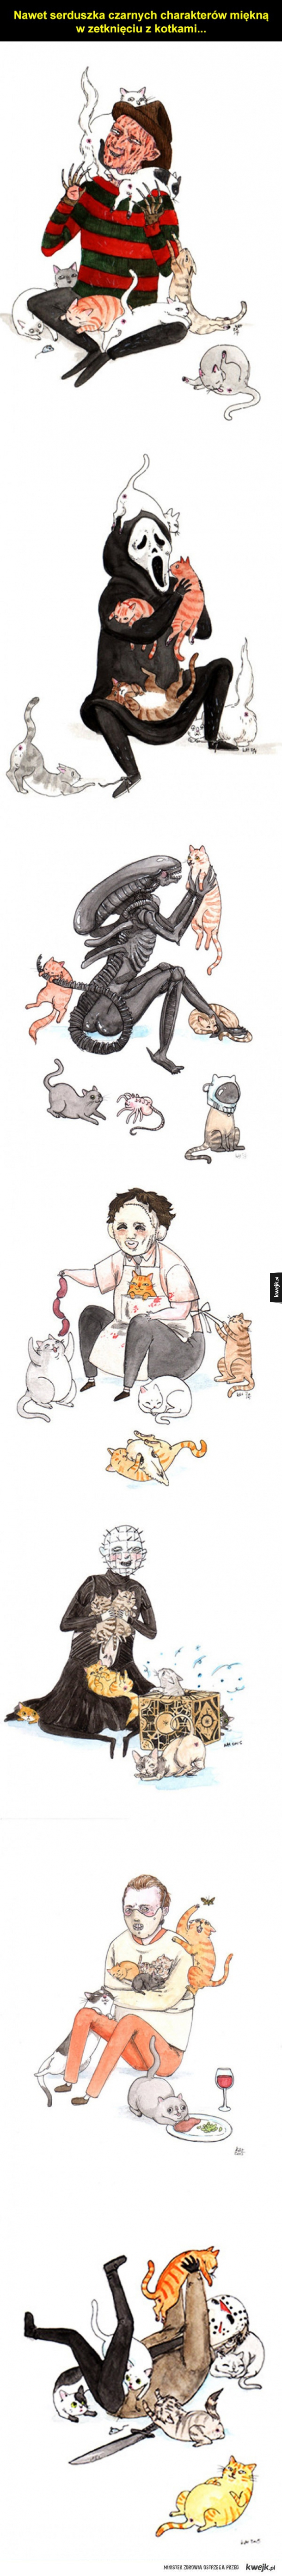 Czarne charaktery z kotkami